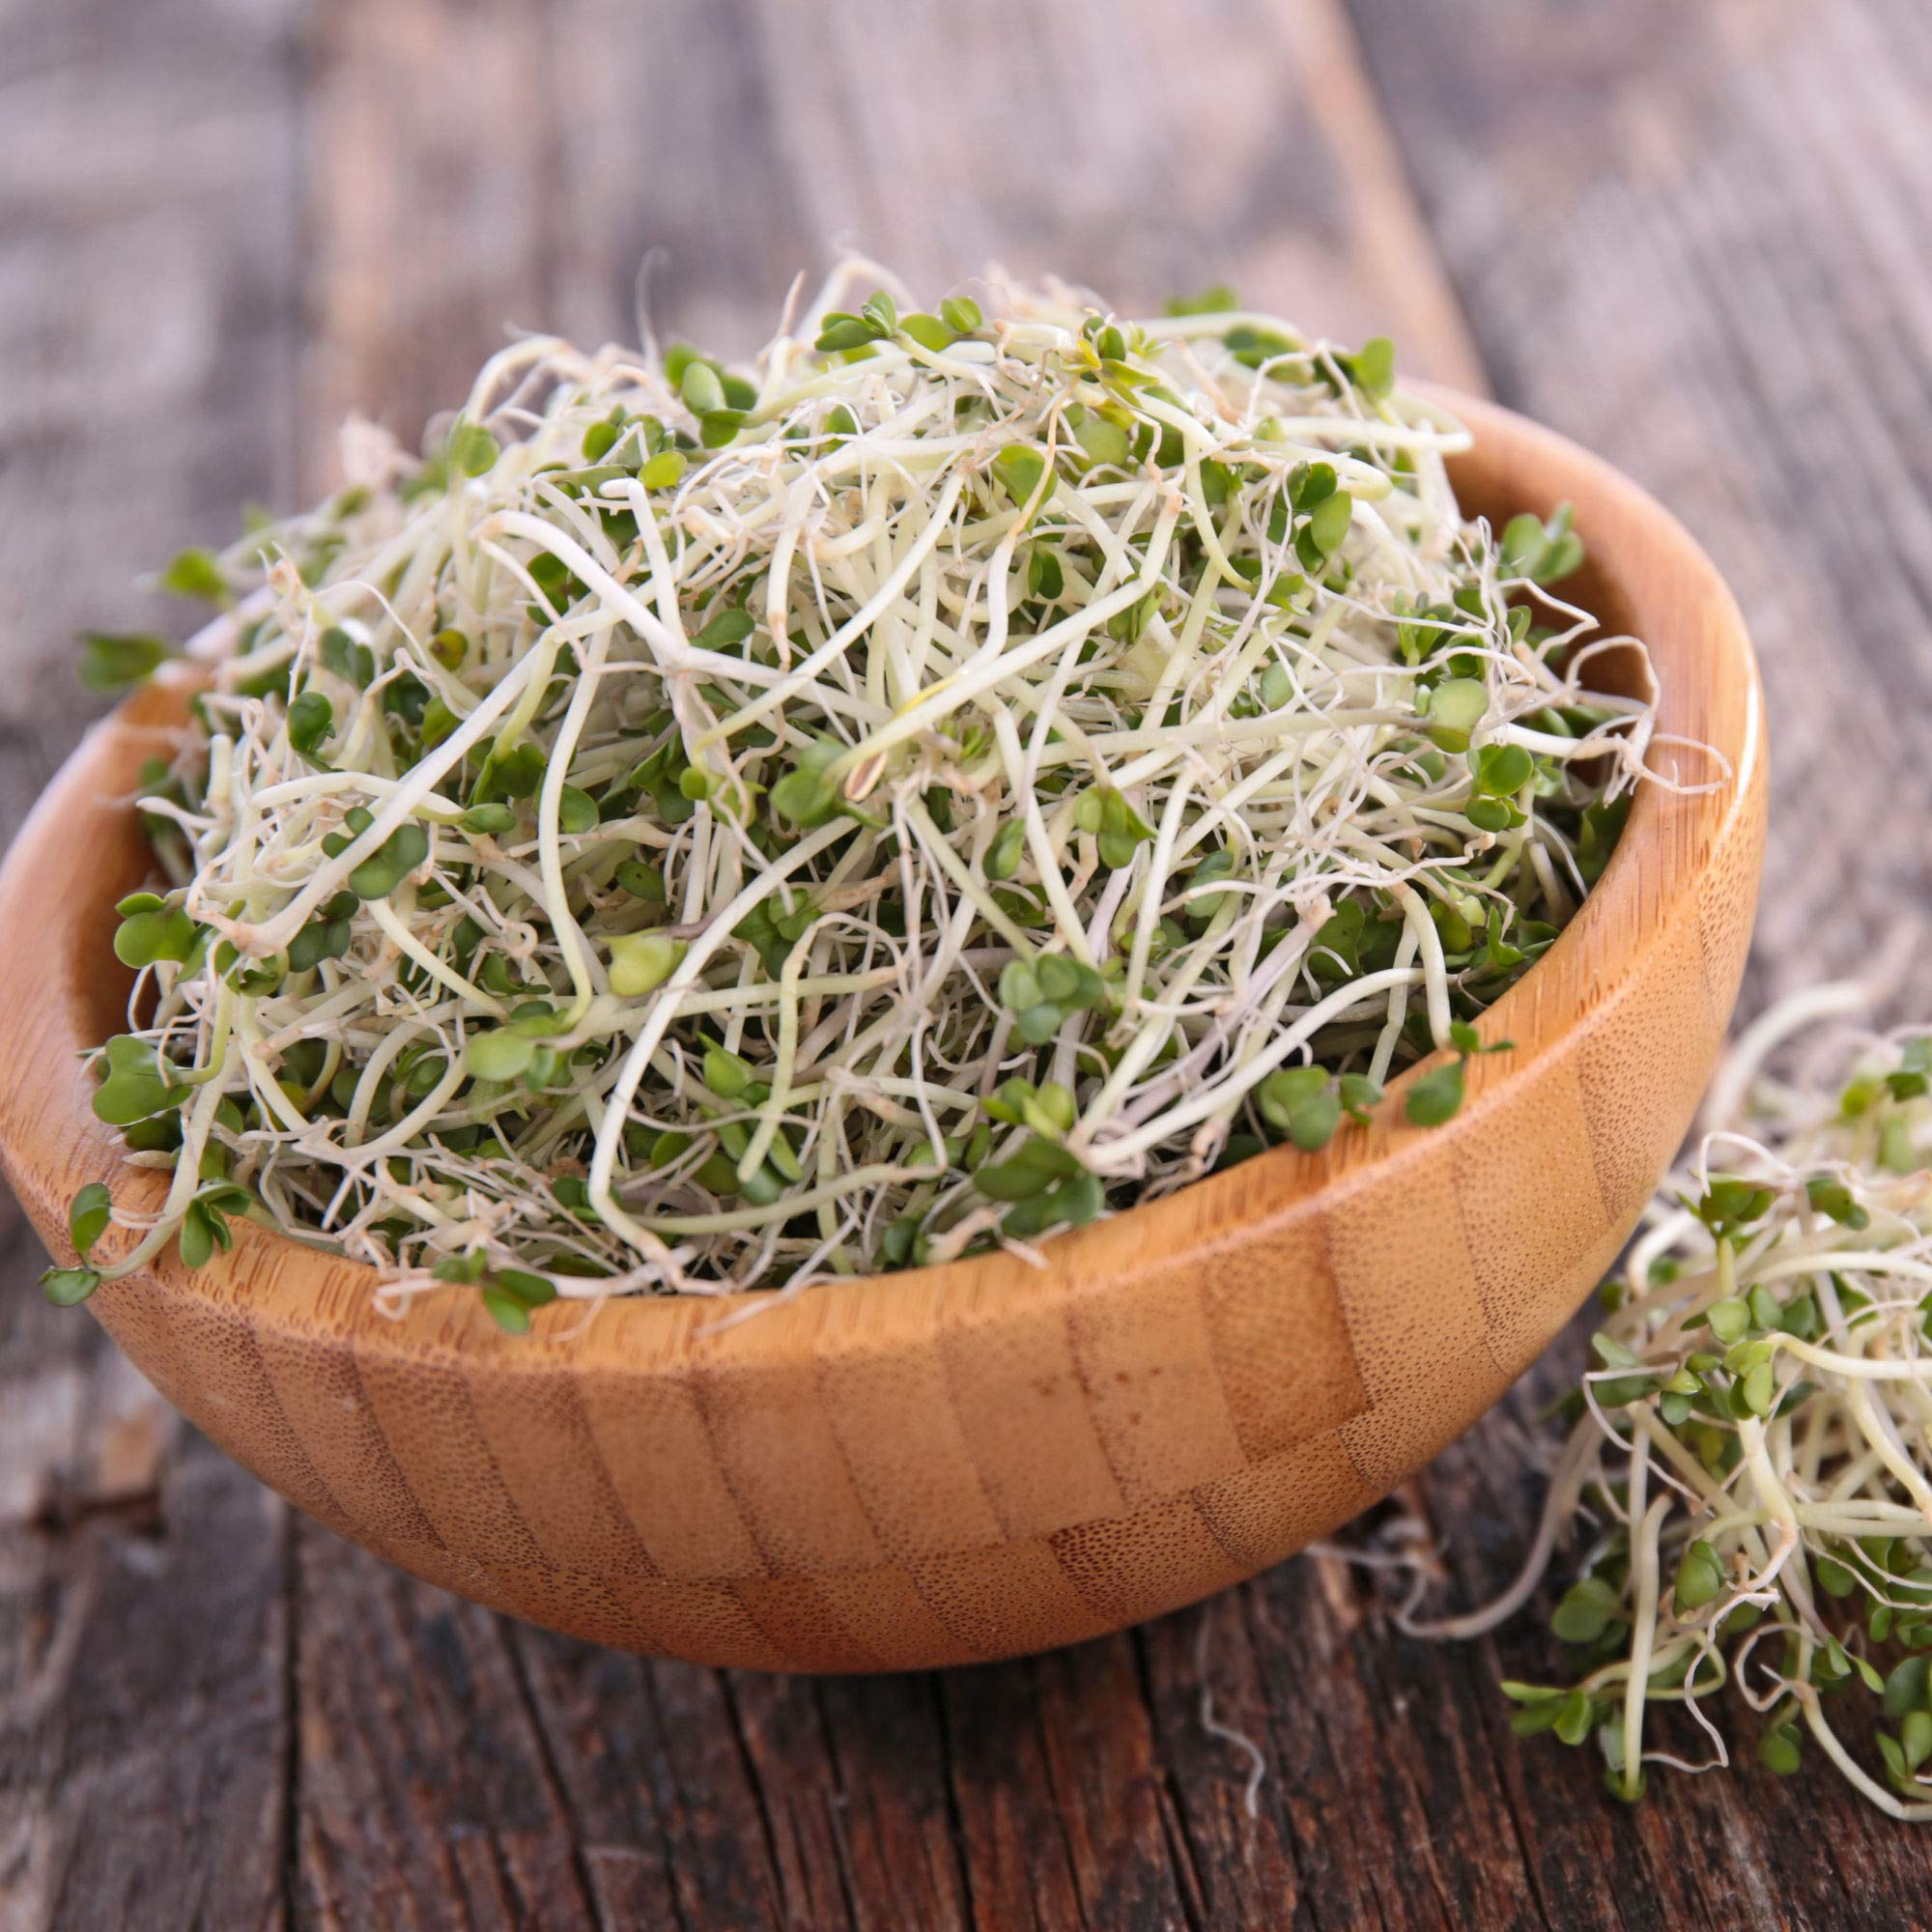 Organic Broccoli Sprouting Seeds by Handy Pantry | 2.5 Pound Resealable Bag | Bulk Non-GMO Broccoli Sprouts Seeds, Contain Sulforaphane by Handy Pantry (Image #3)